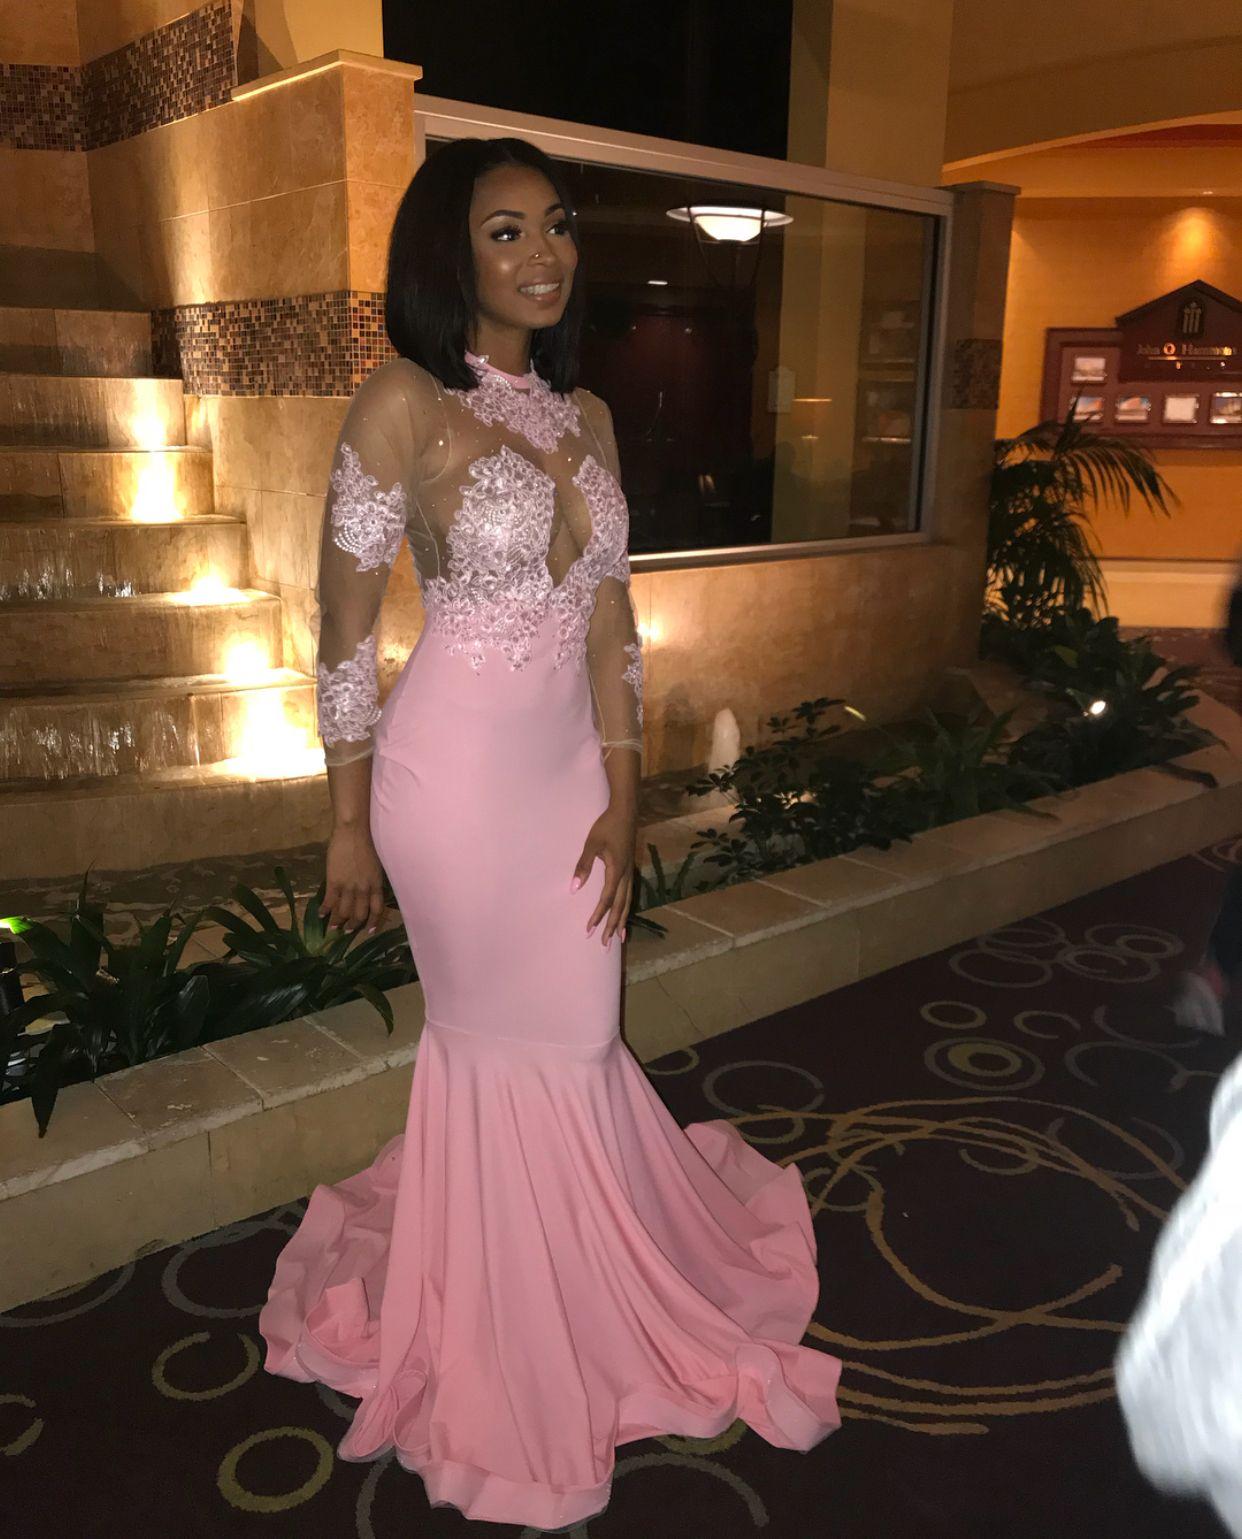 Yslrina Black Girl Prom Dresses Cute Prom Dresses Prom Girl Dresses